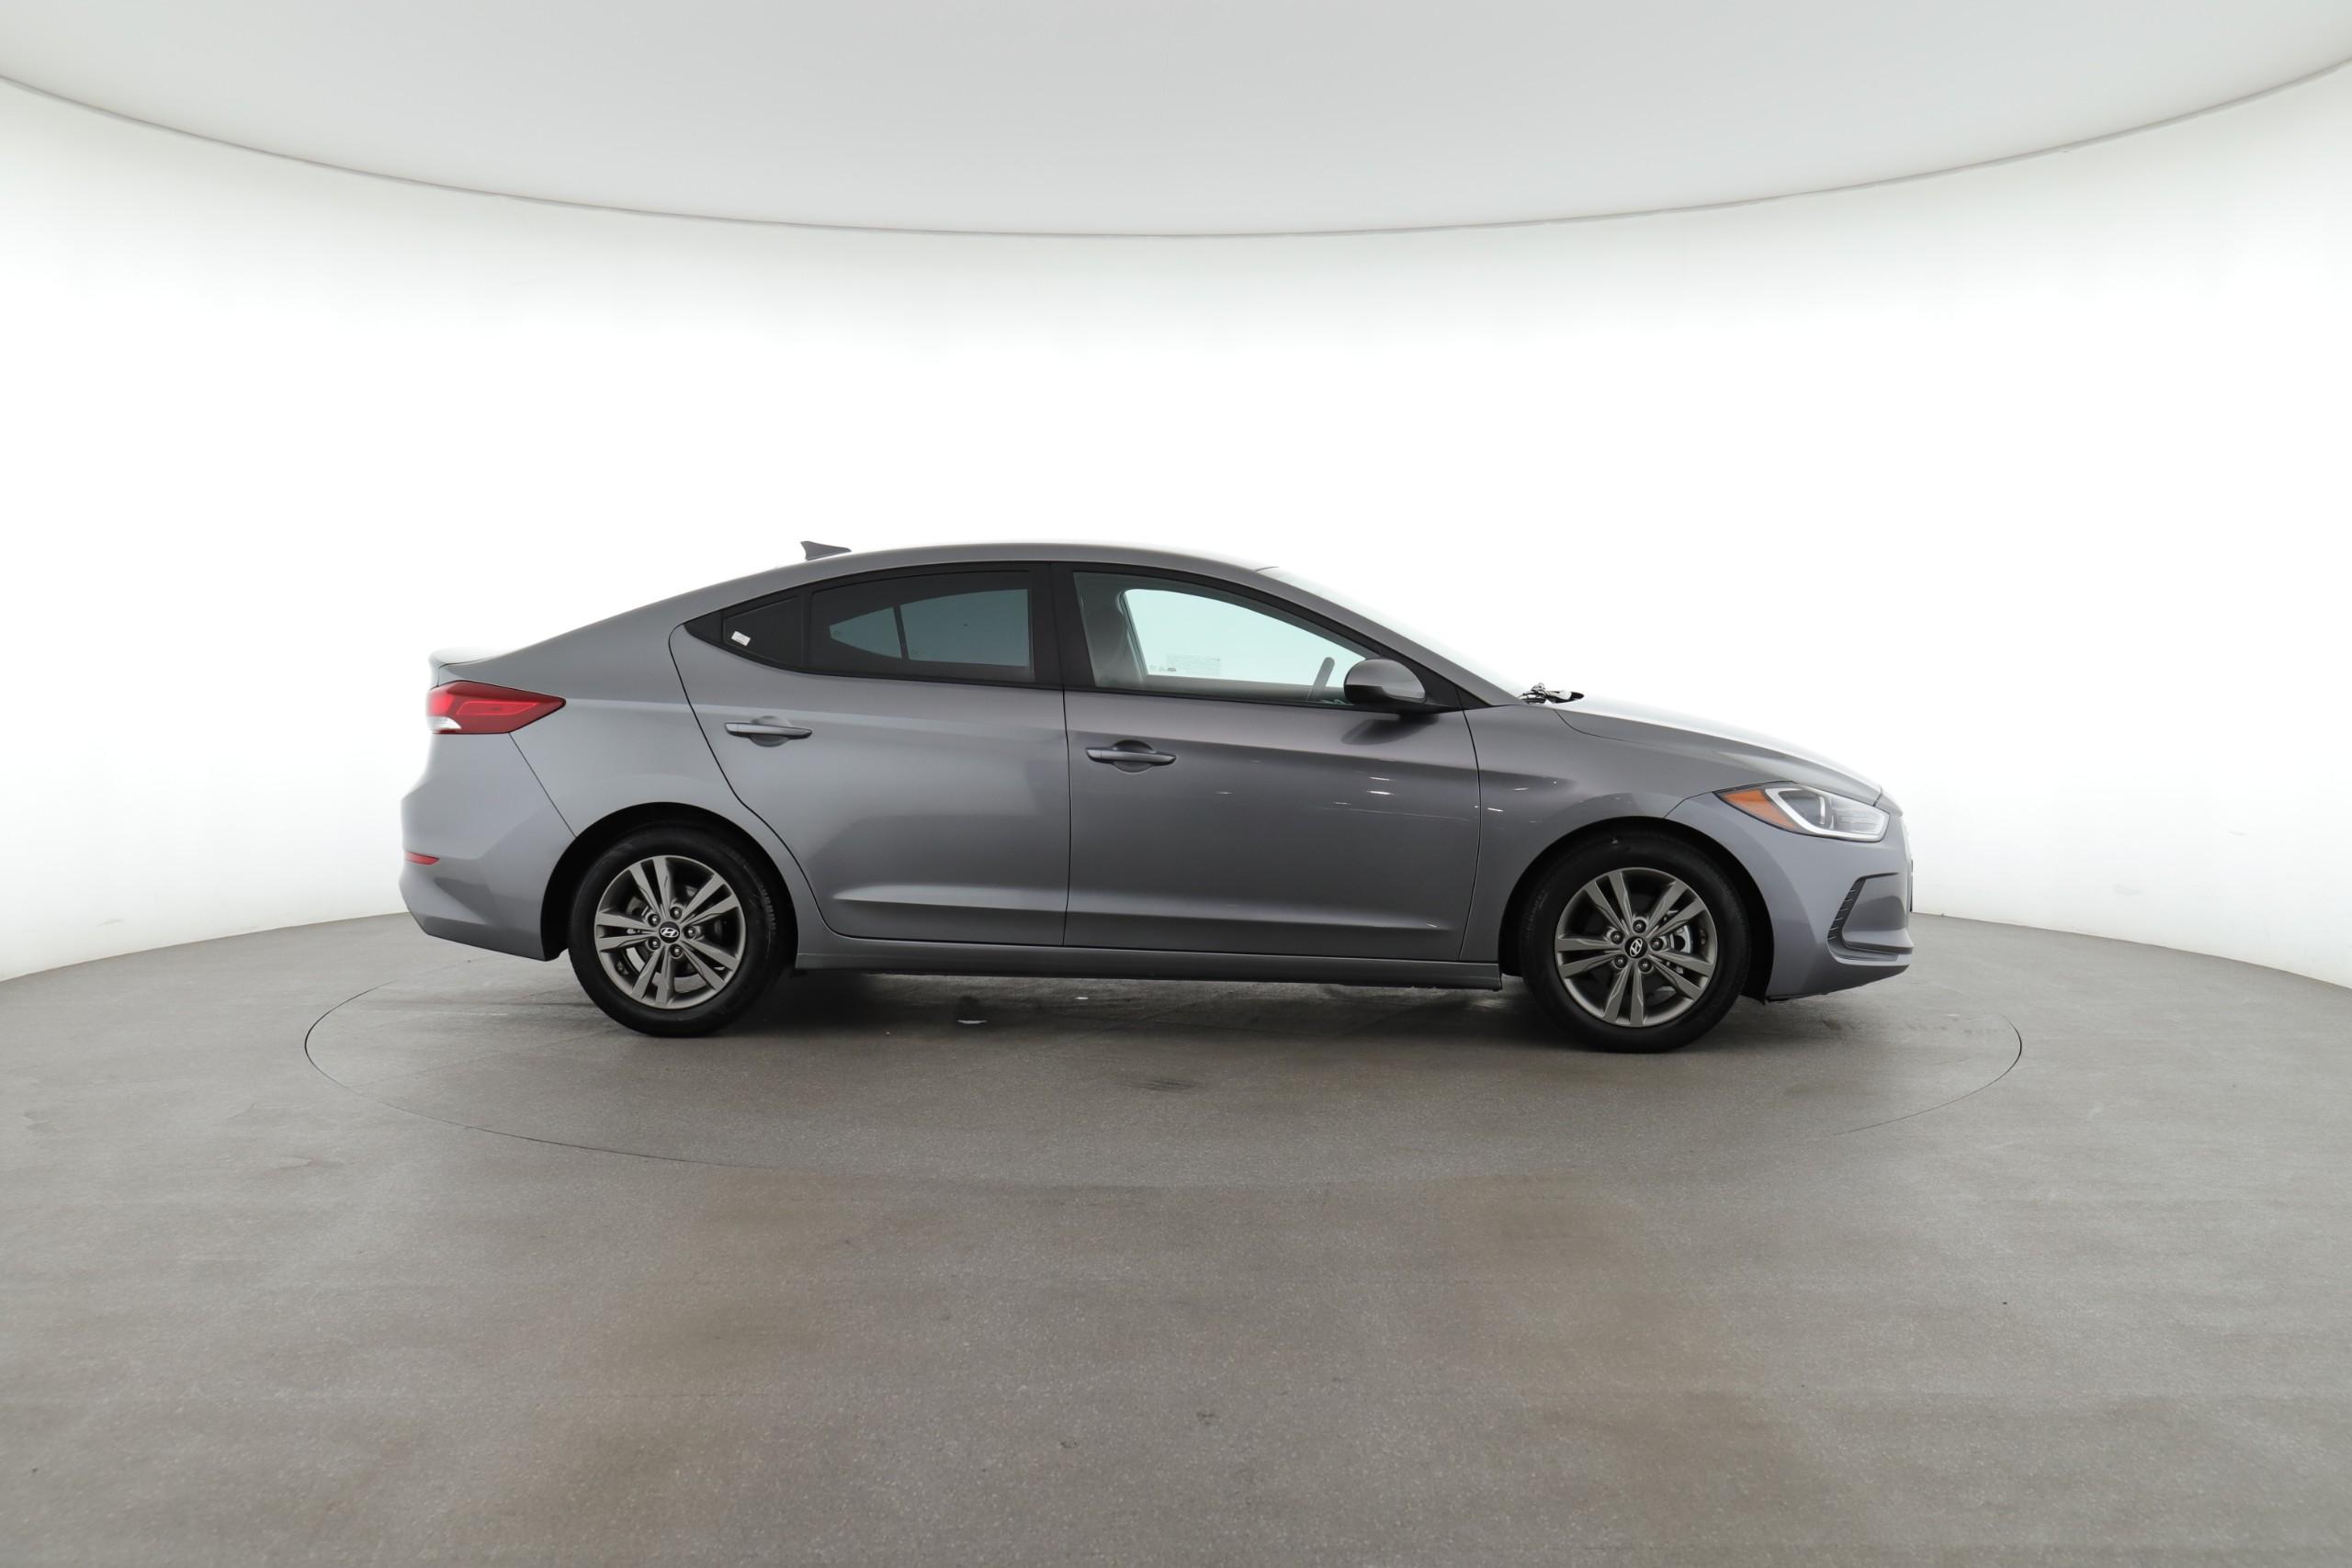 2018 Hyundai Elantra SEL (from $15,650)